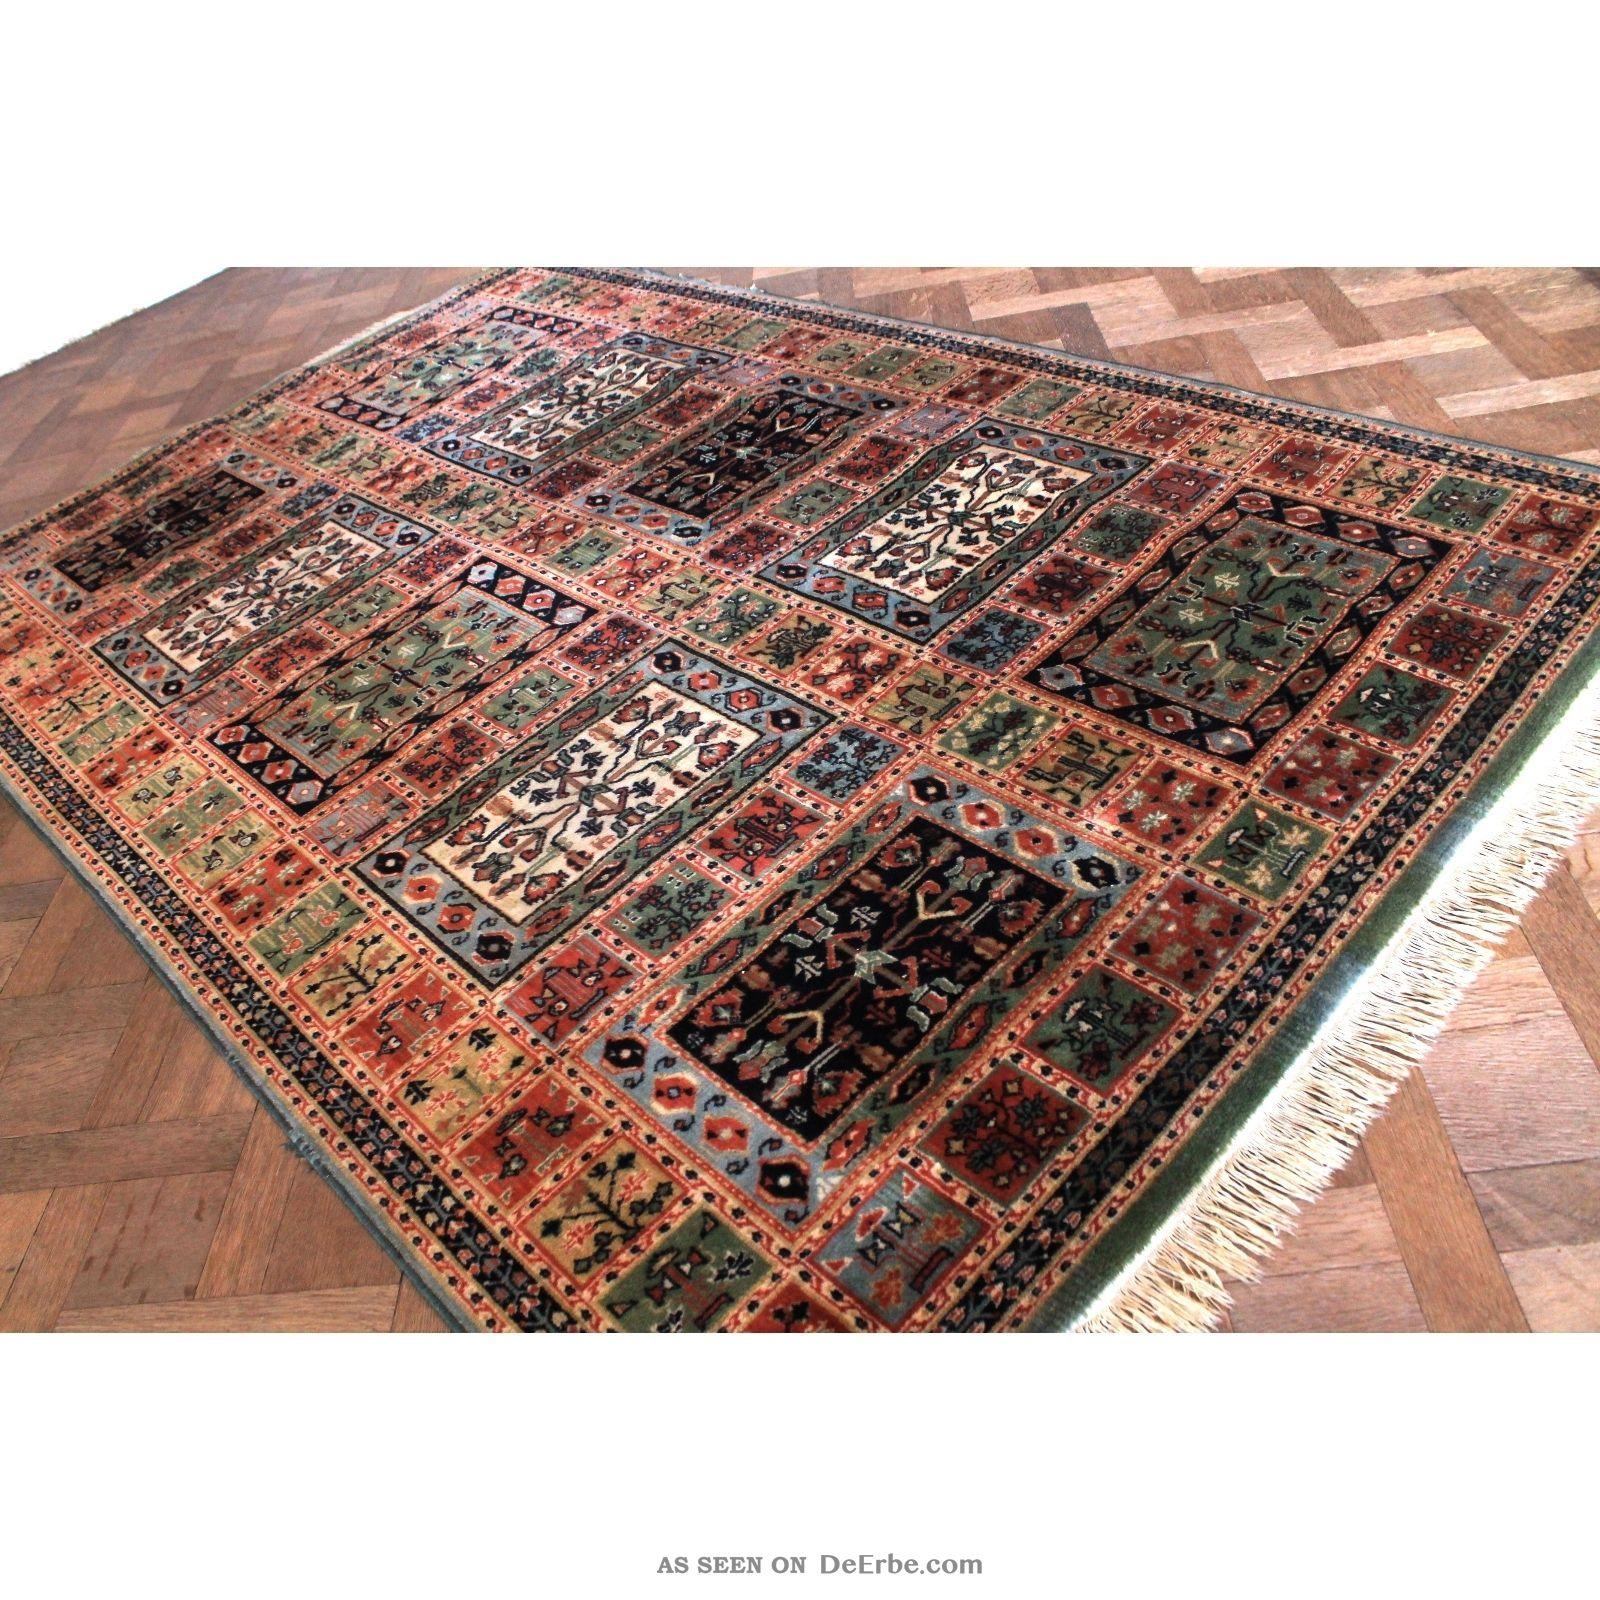 sch ner gewebter orient teppich felder nain carpet tappeto. Black Bedroom Furniture Sets. Home Design Ideas